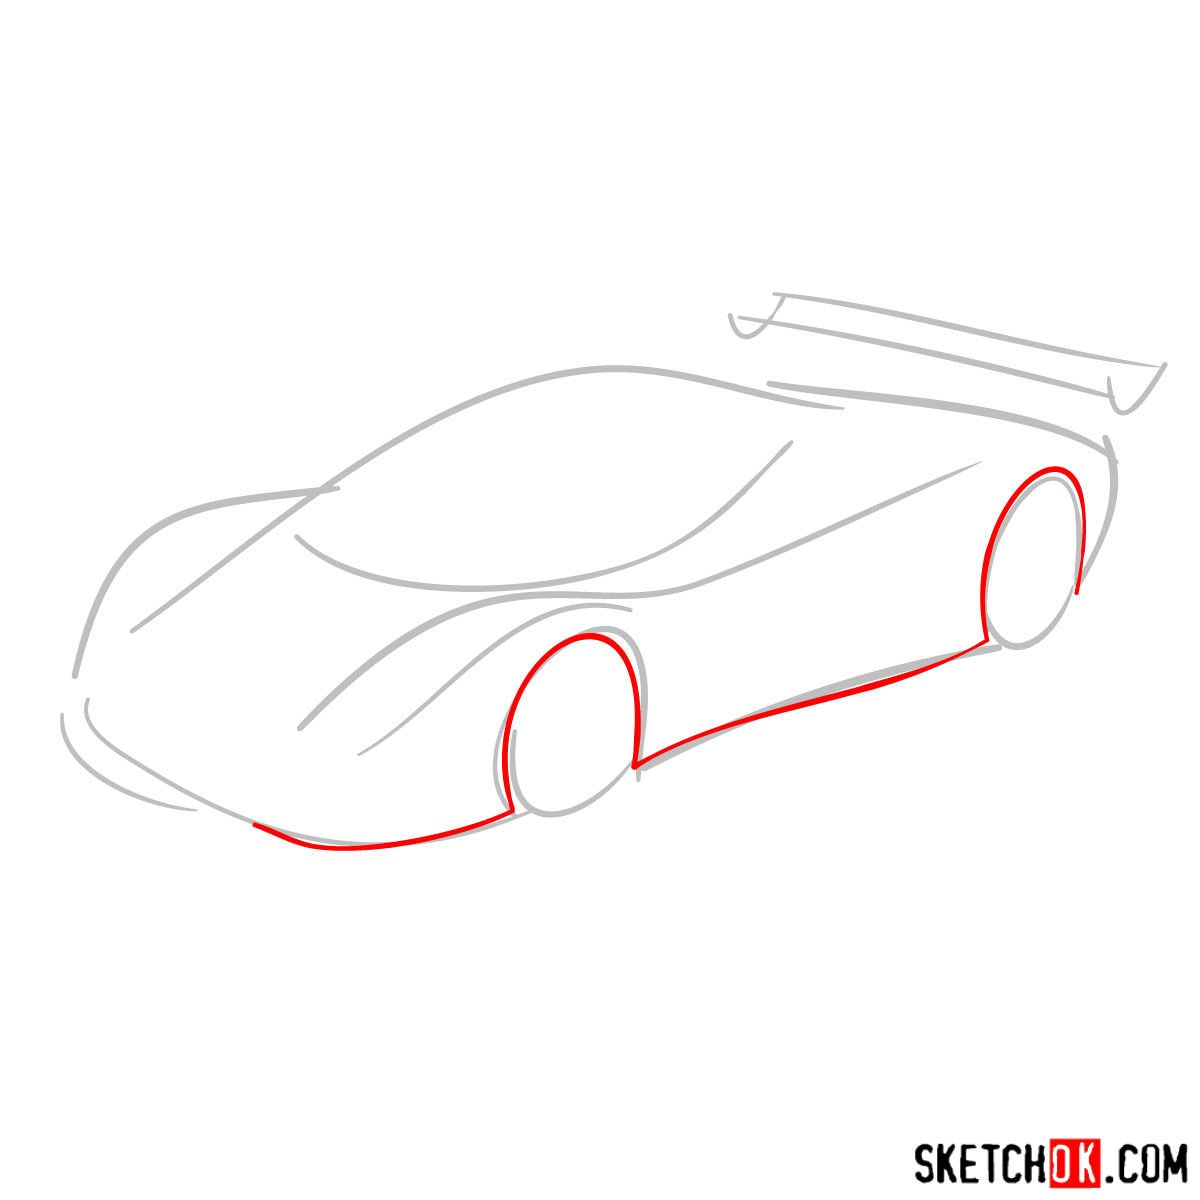 How to draw Pagani Zonda - step 02